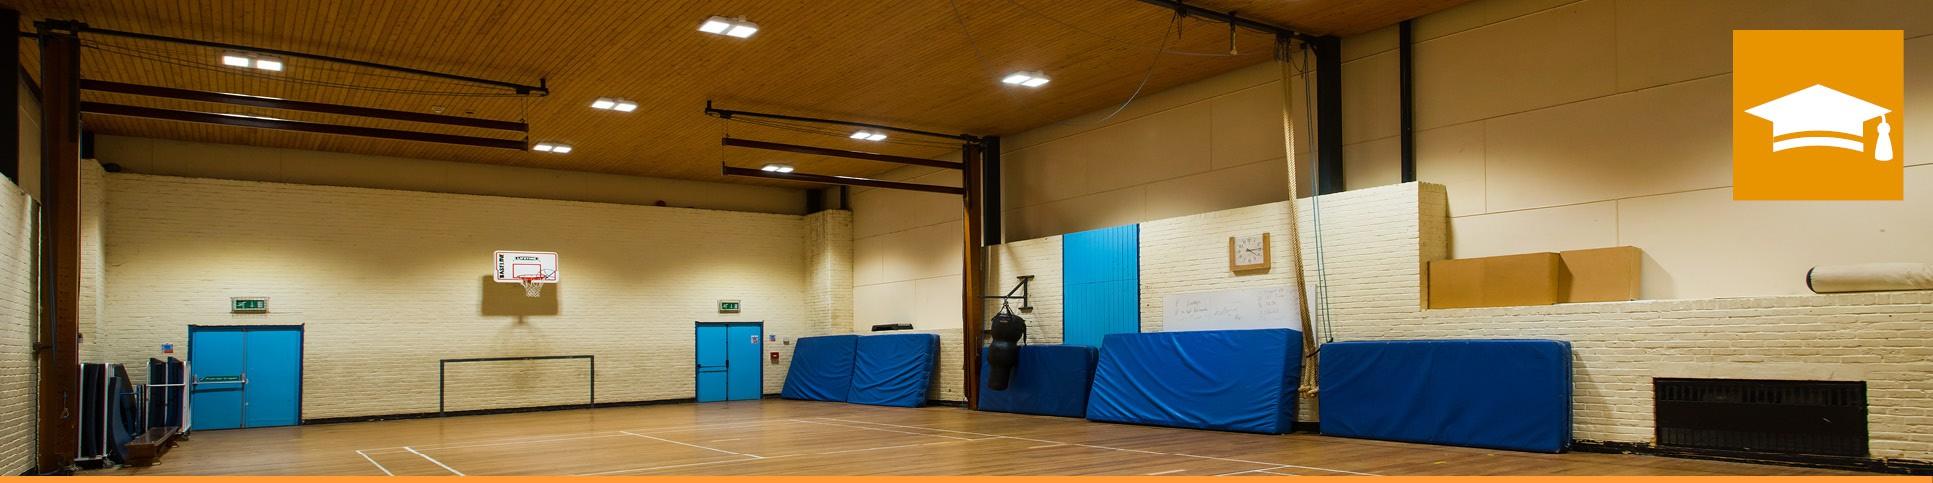 Lighting for Sports Halls